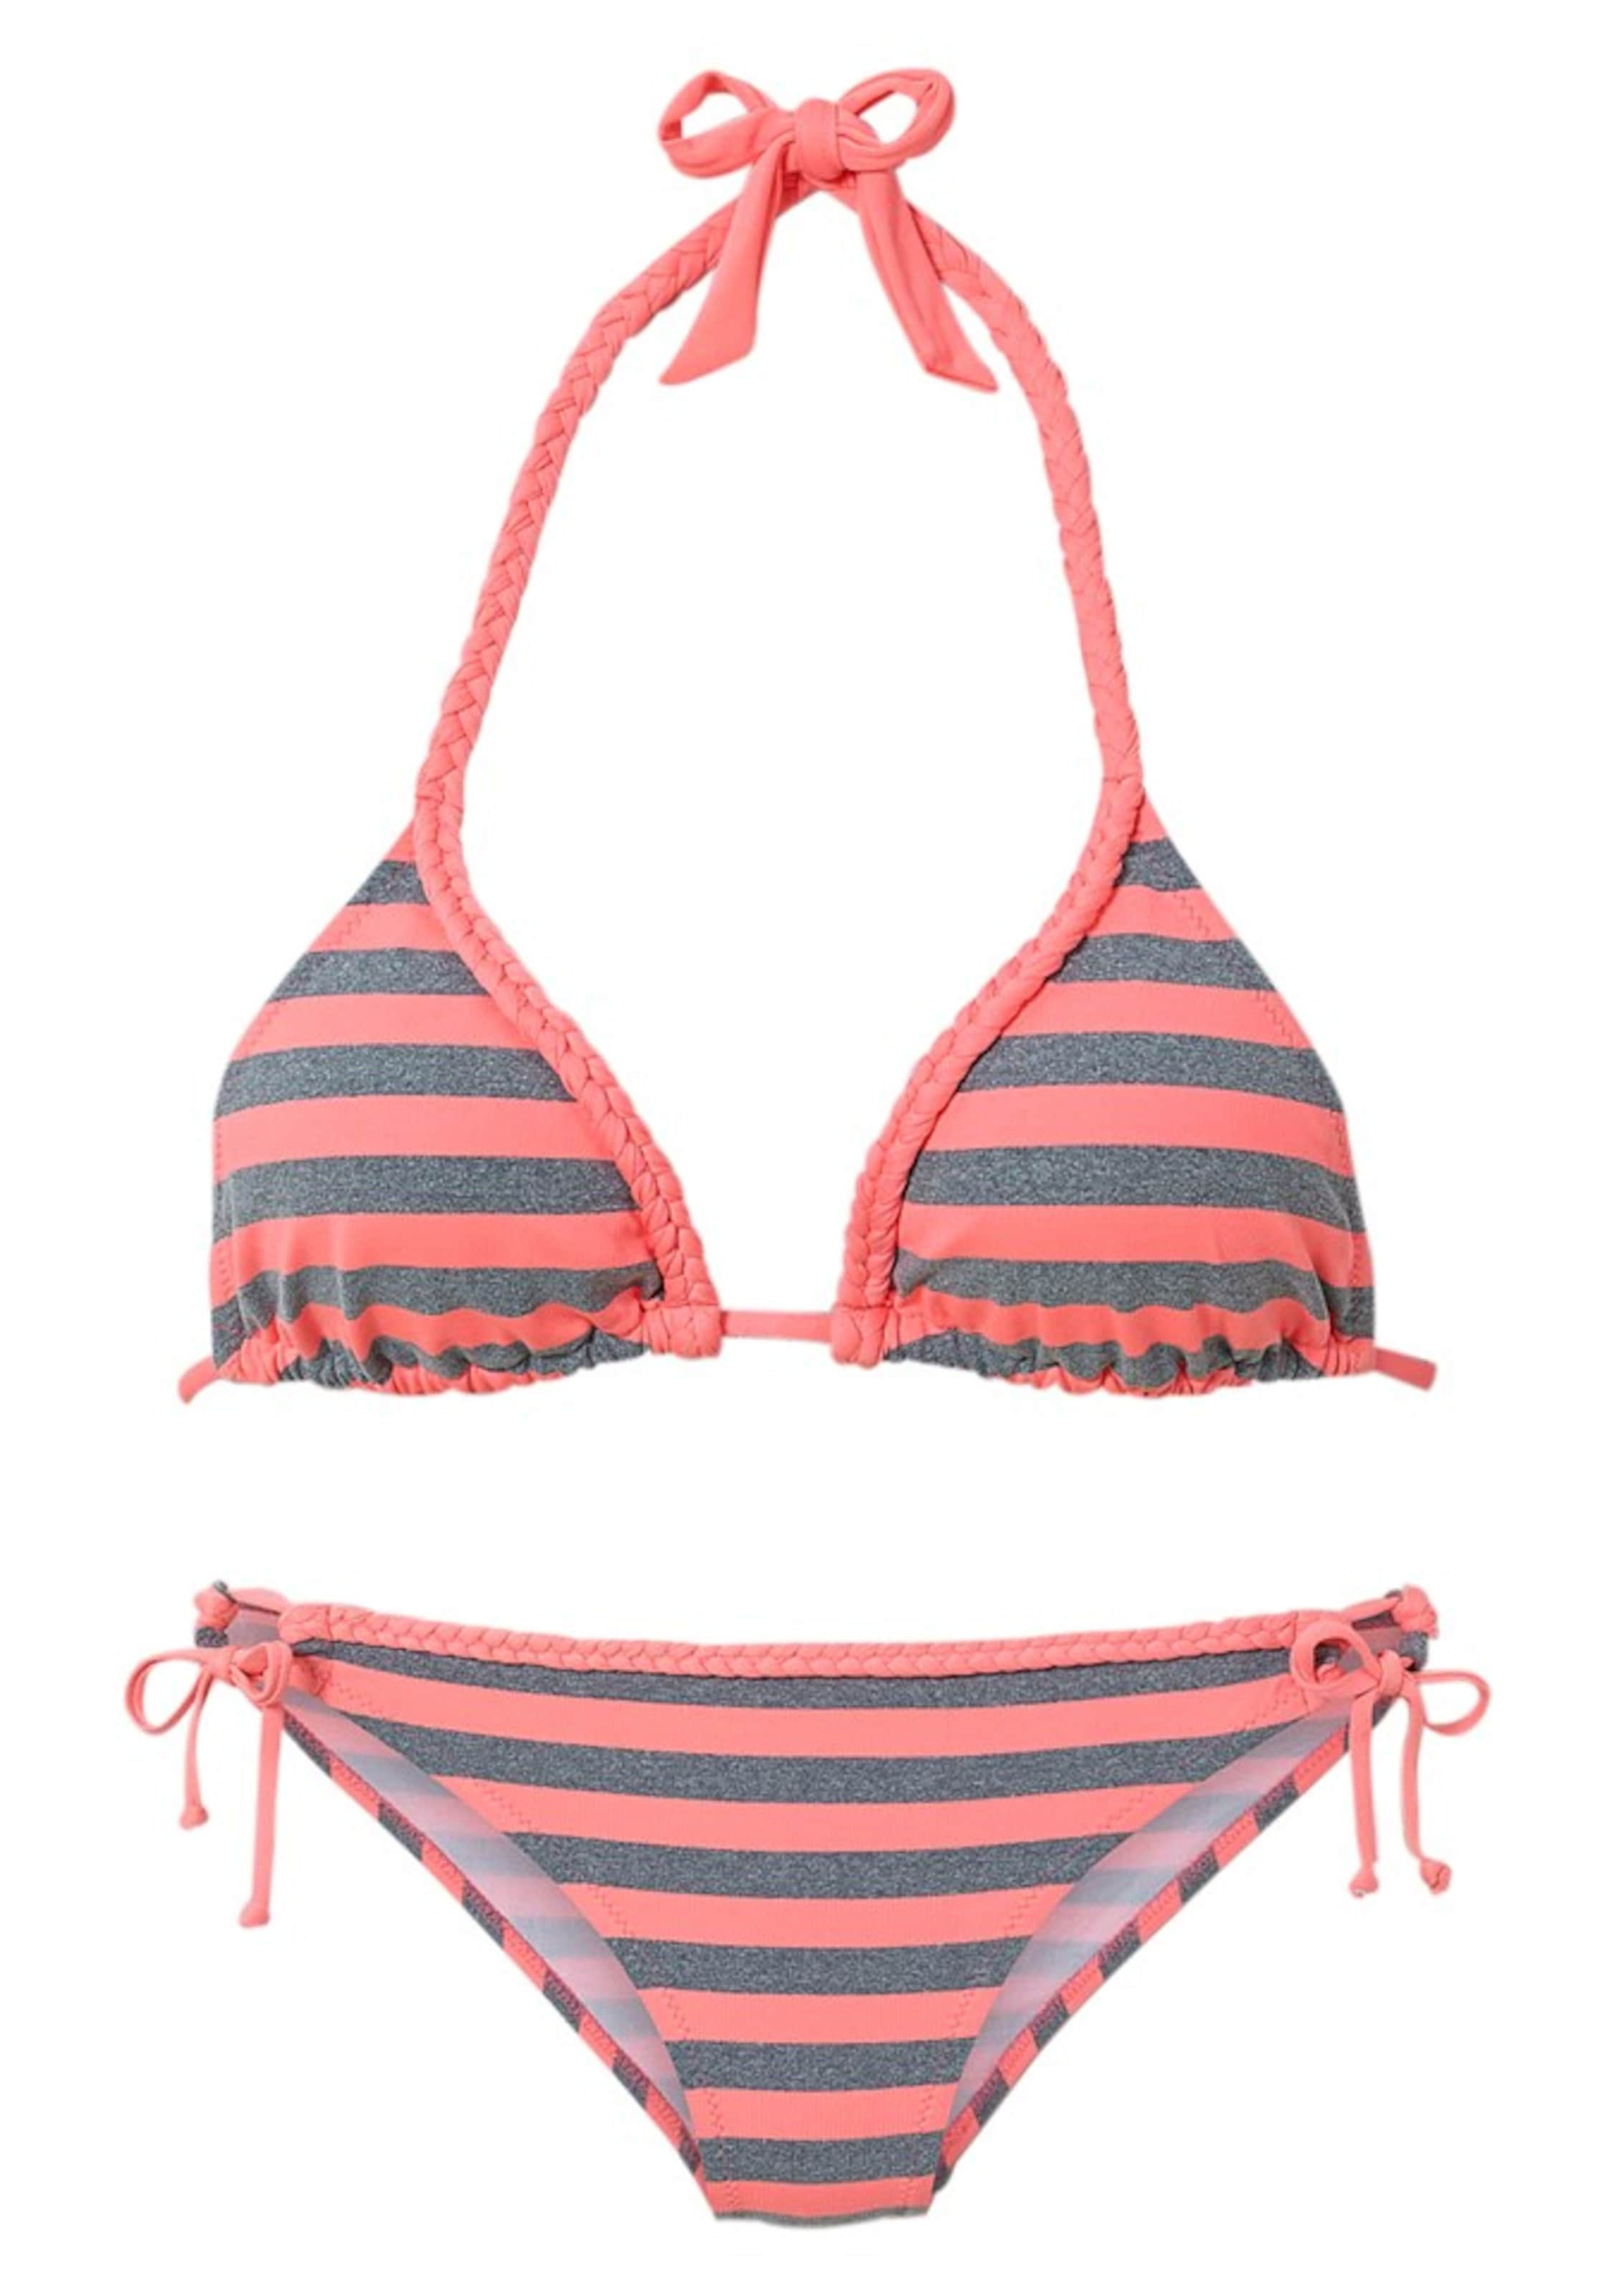 En Beach Rose Foncé Bikini GrisCorail Venice 5L3jcRA4q